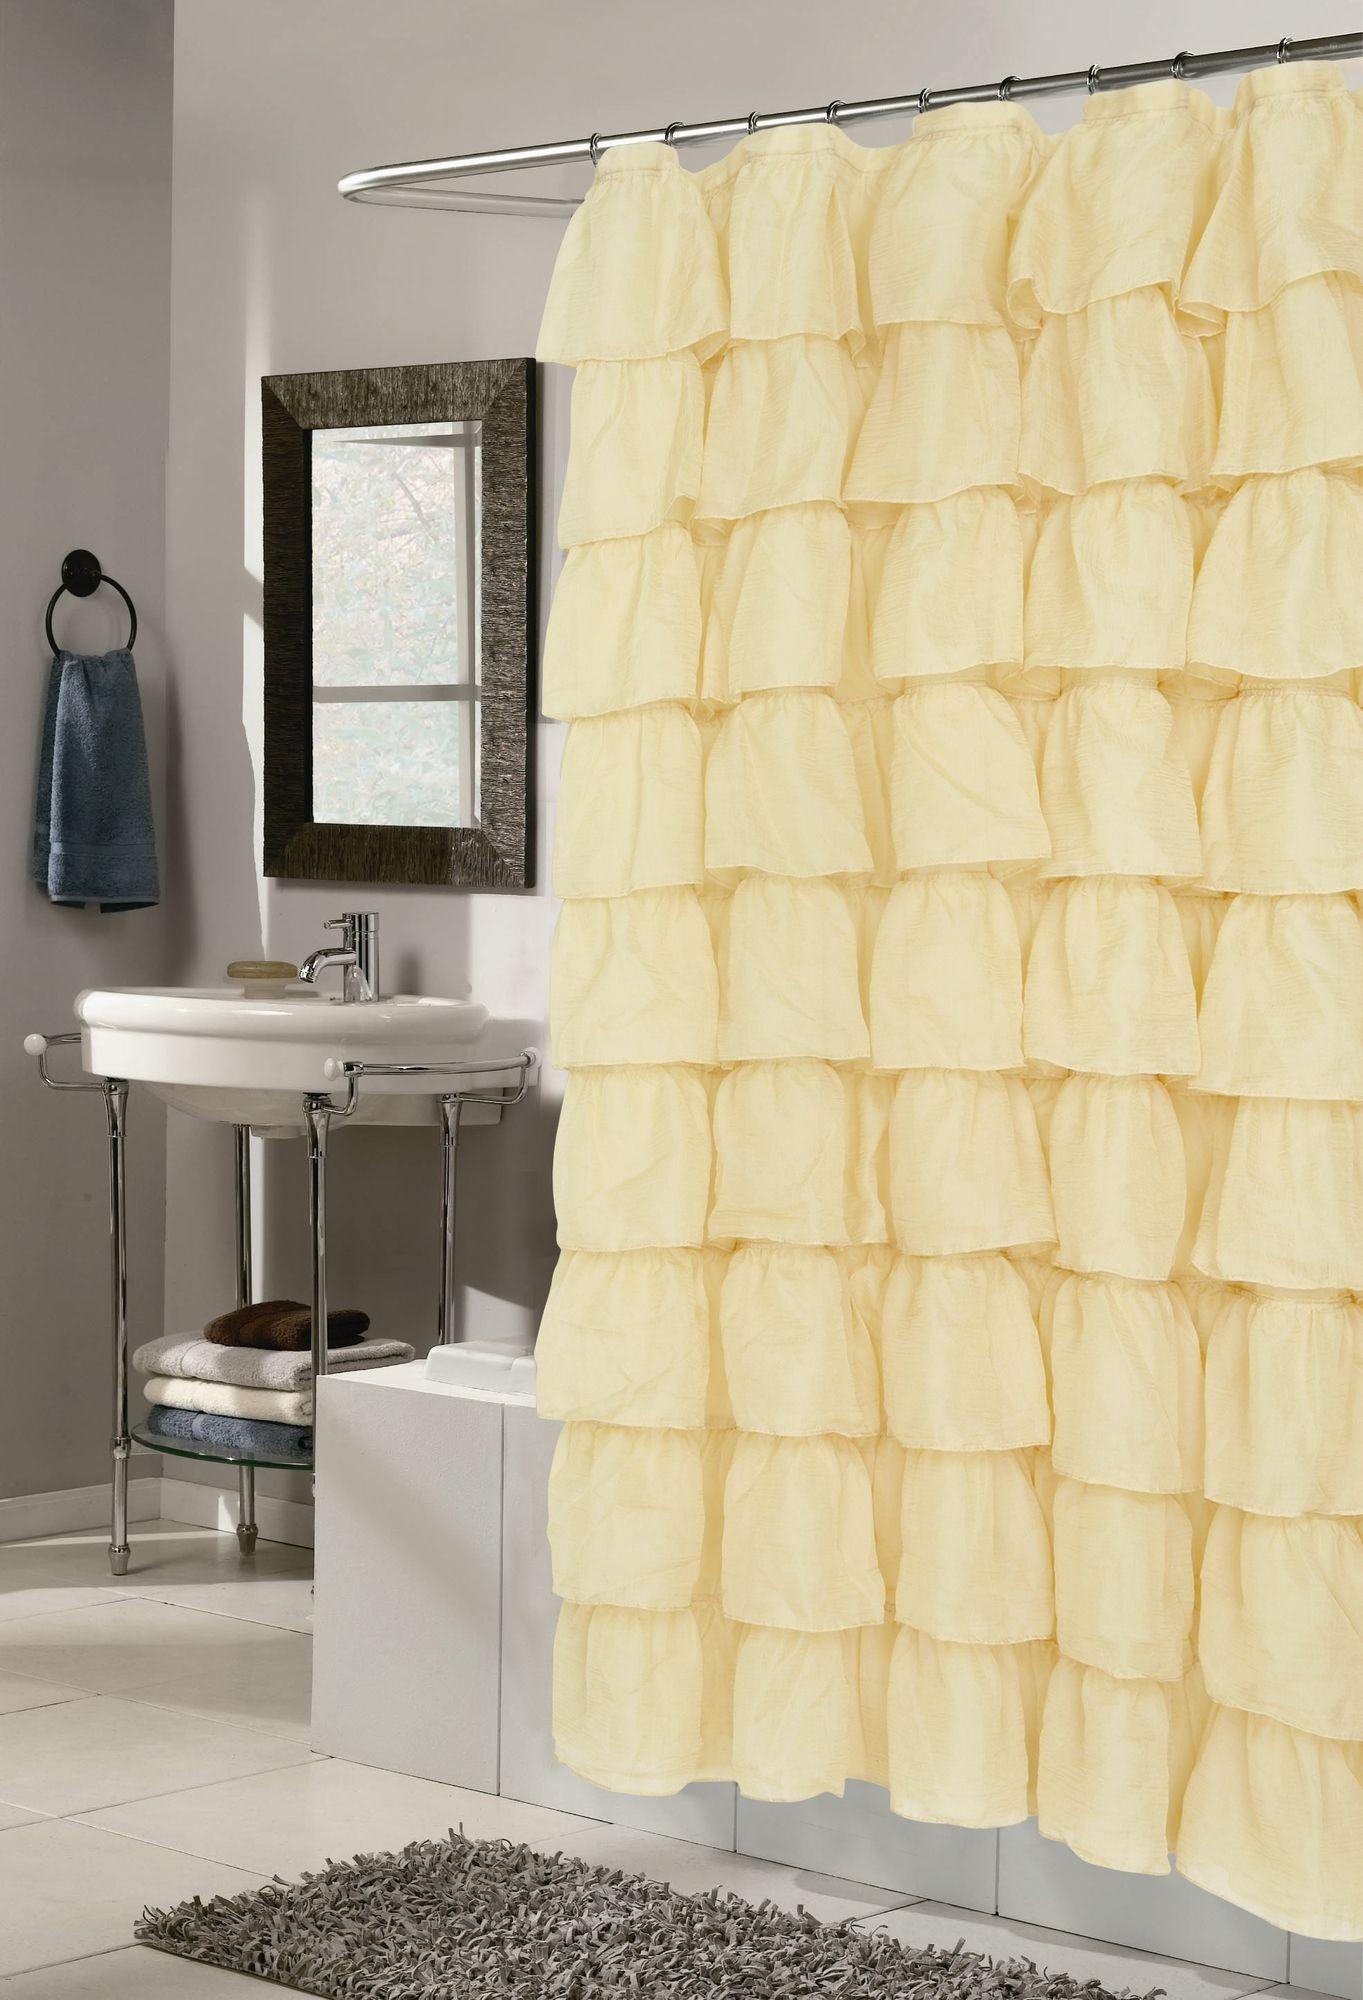 Guestgirls bathroom kaylahs room ideas teen girls rooms